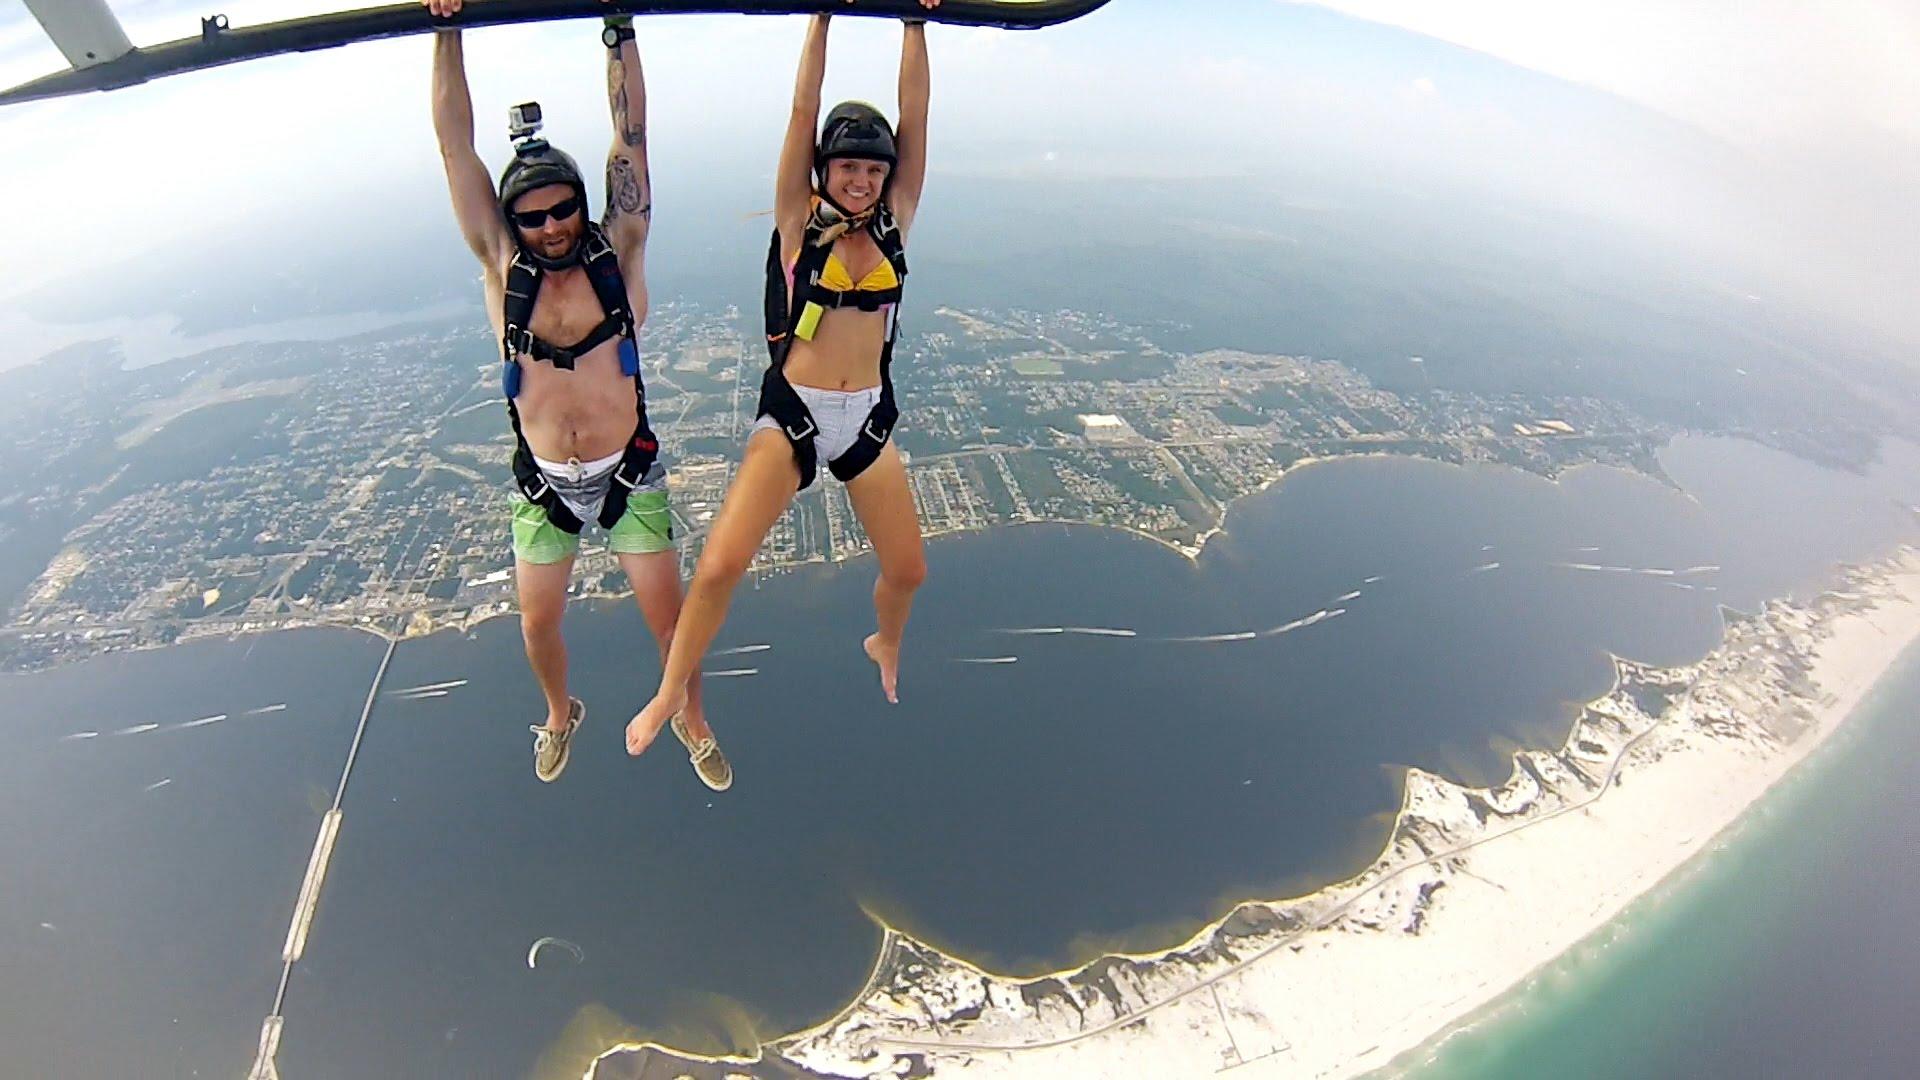 Professional parachuting photo